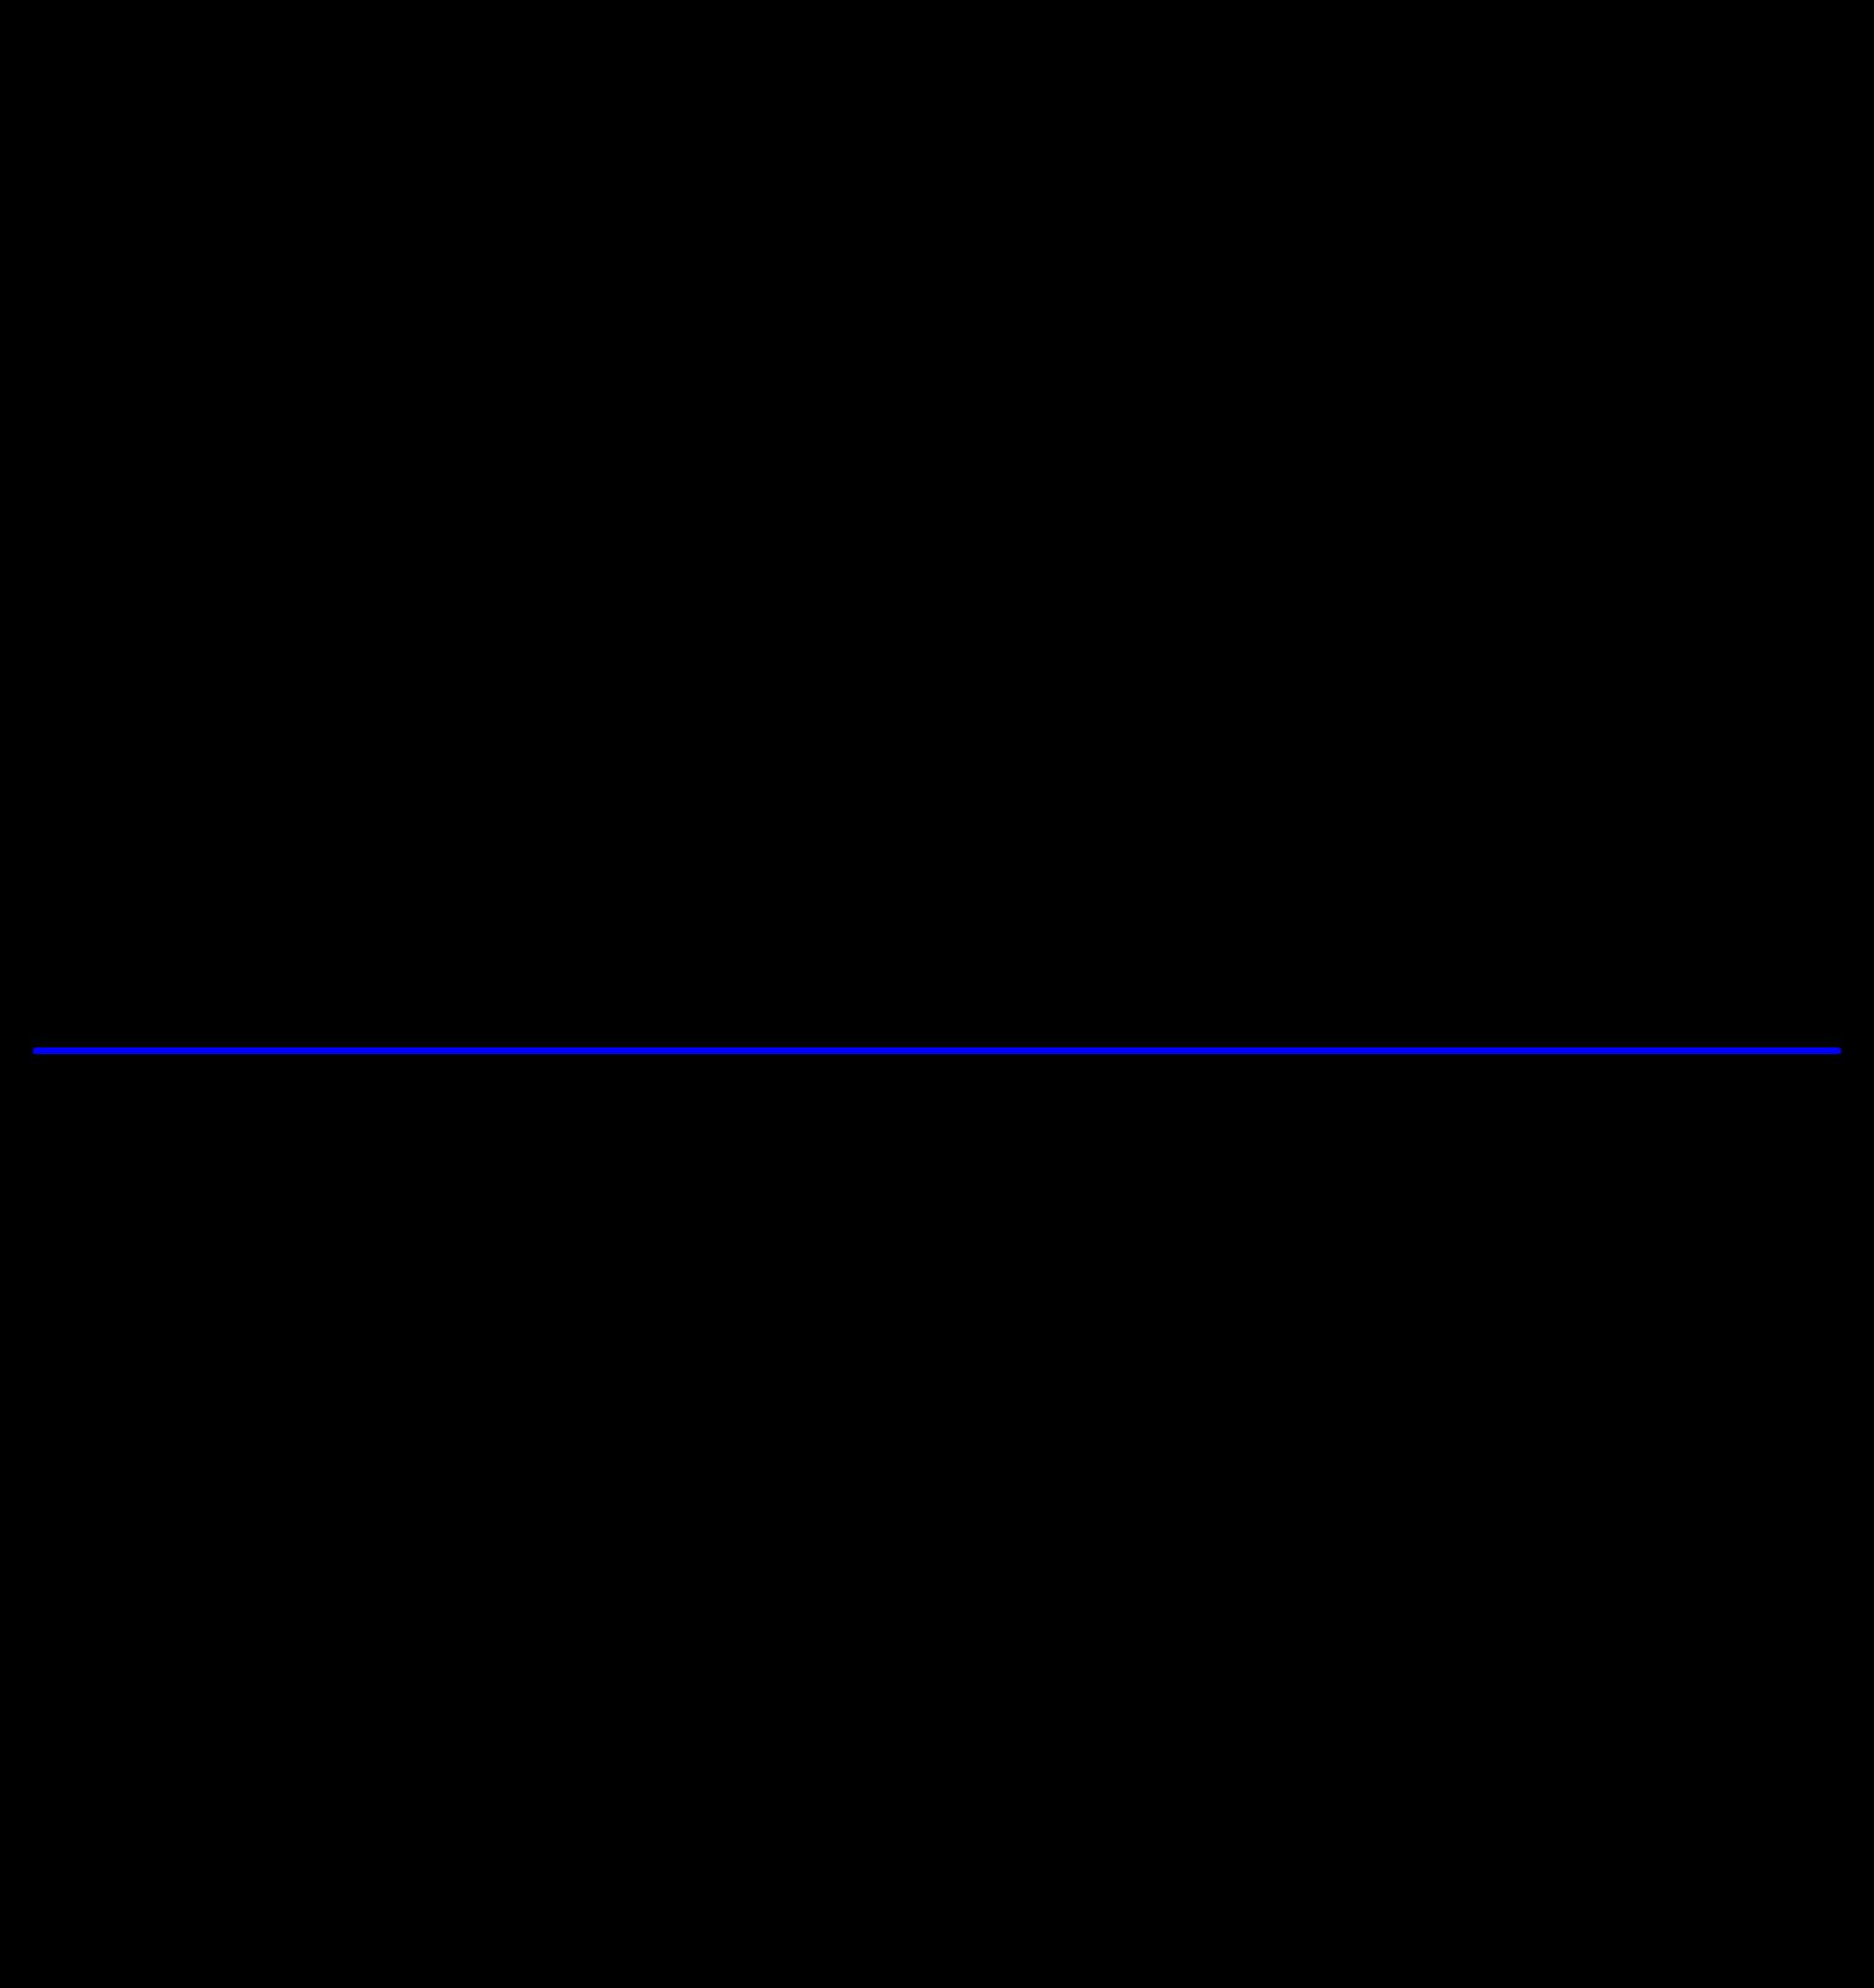 2000x2122 Filecircle Diameter Circumference.svg